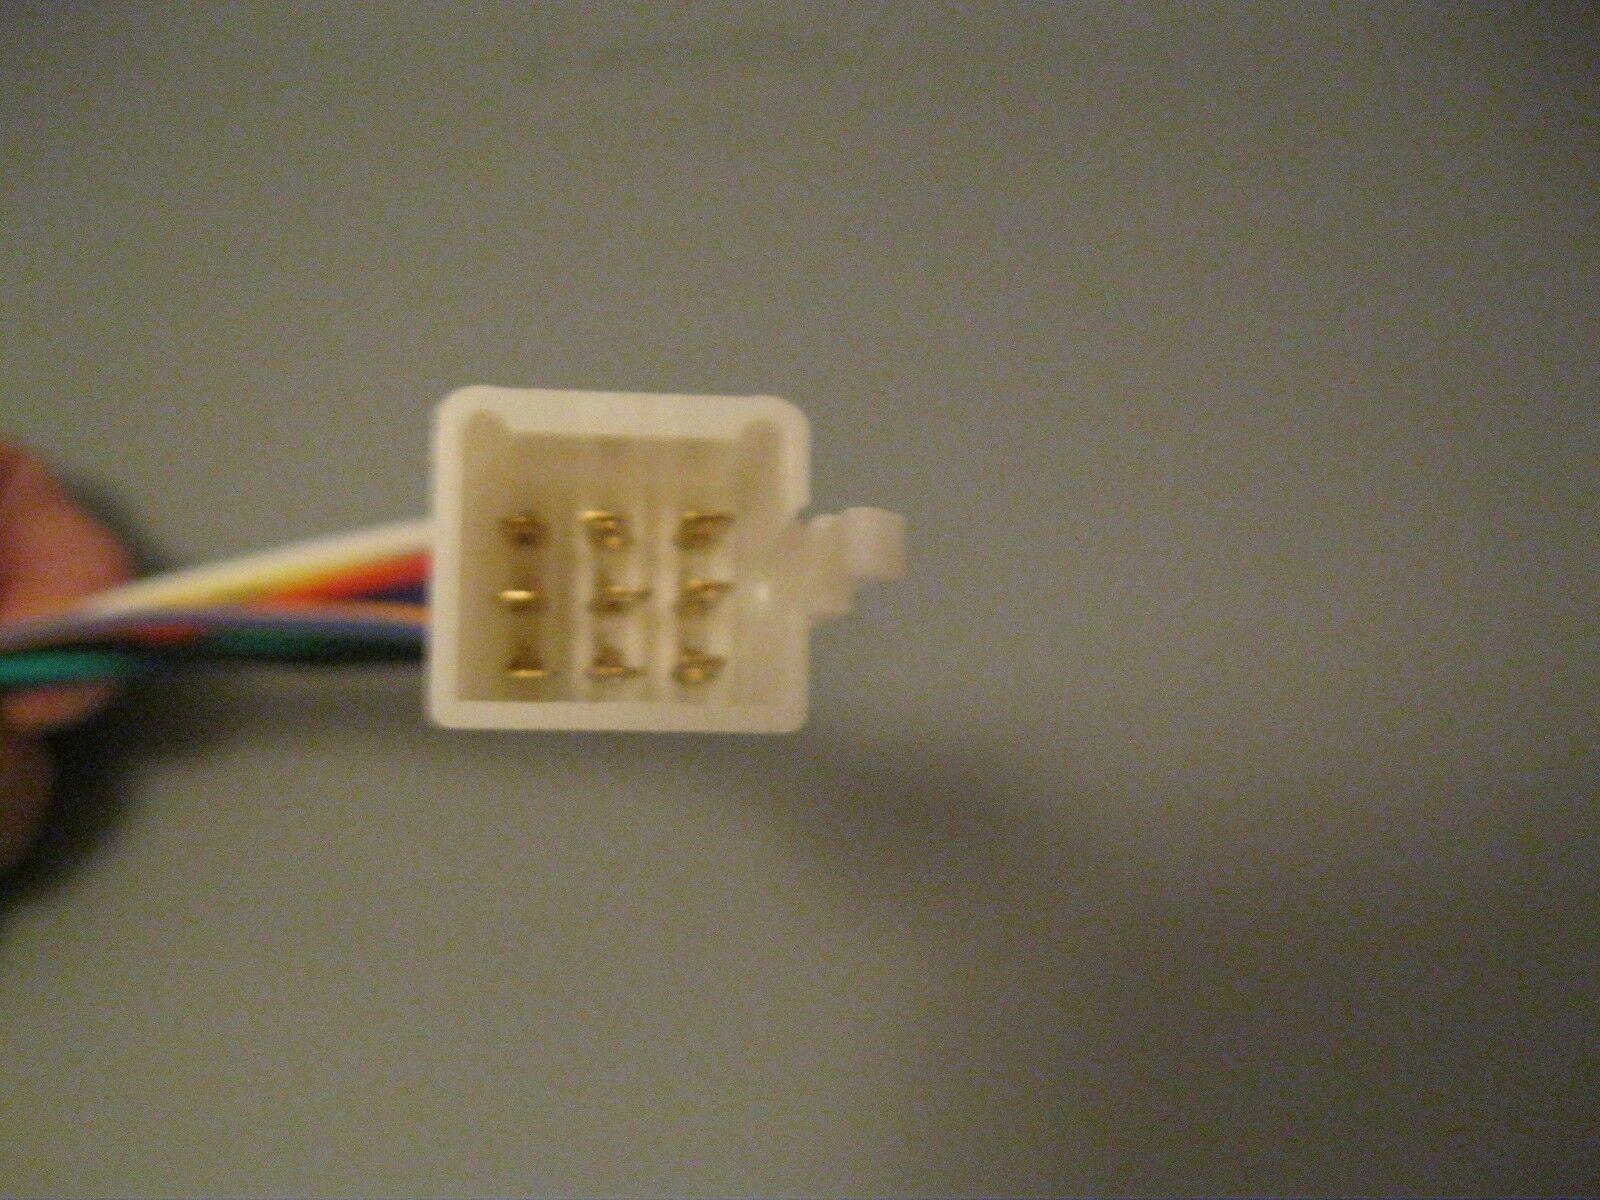 Kubota 9 Pin Radio Wire Harness Tractor RTV Plug CD Player In Dash Stereo  Item Number: 182992801086